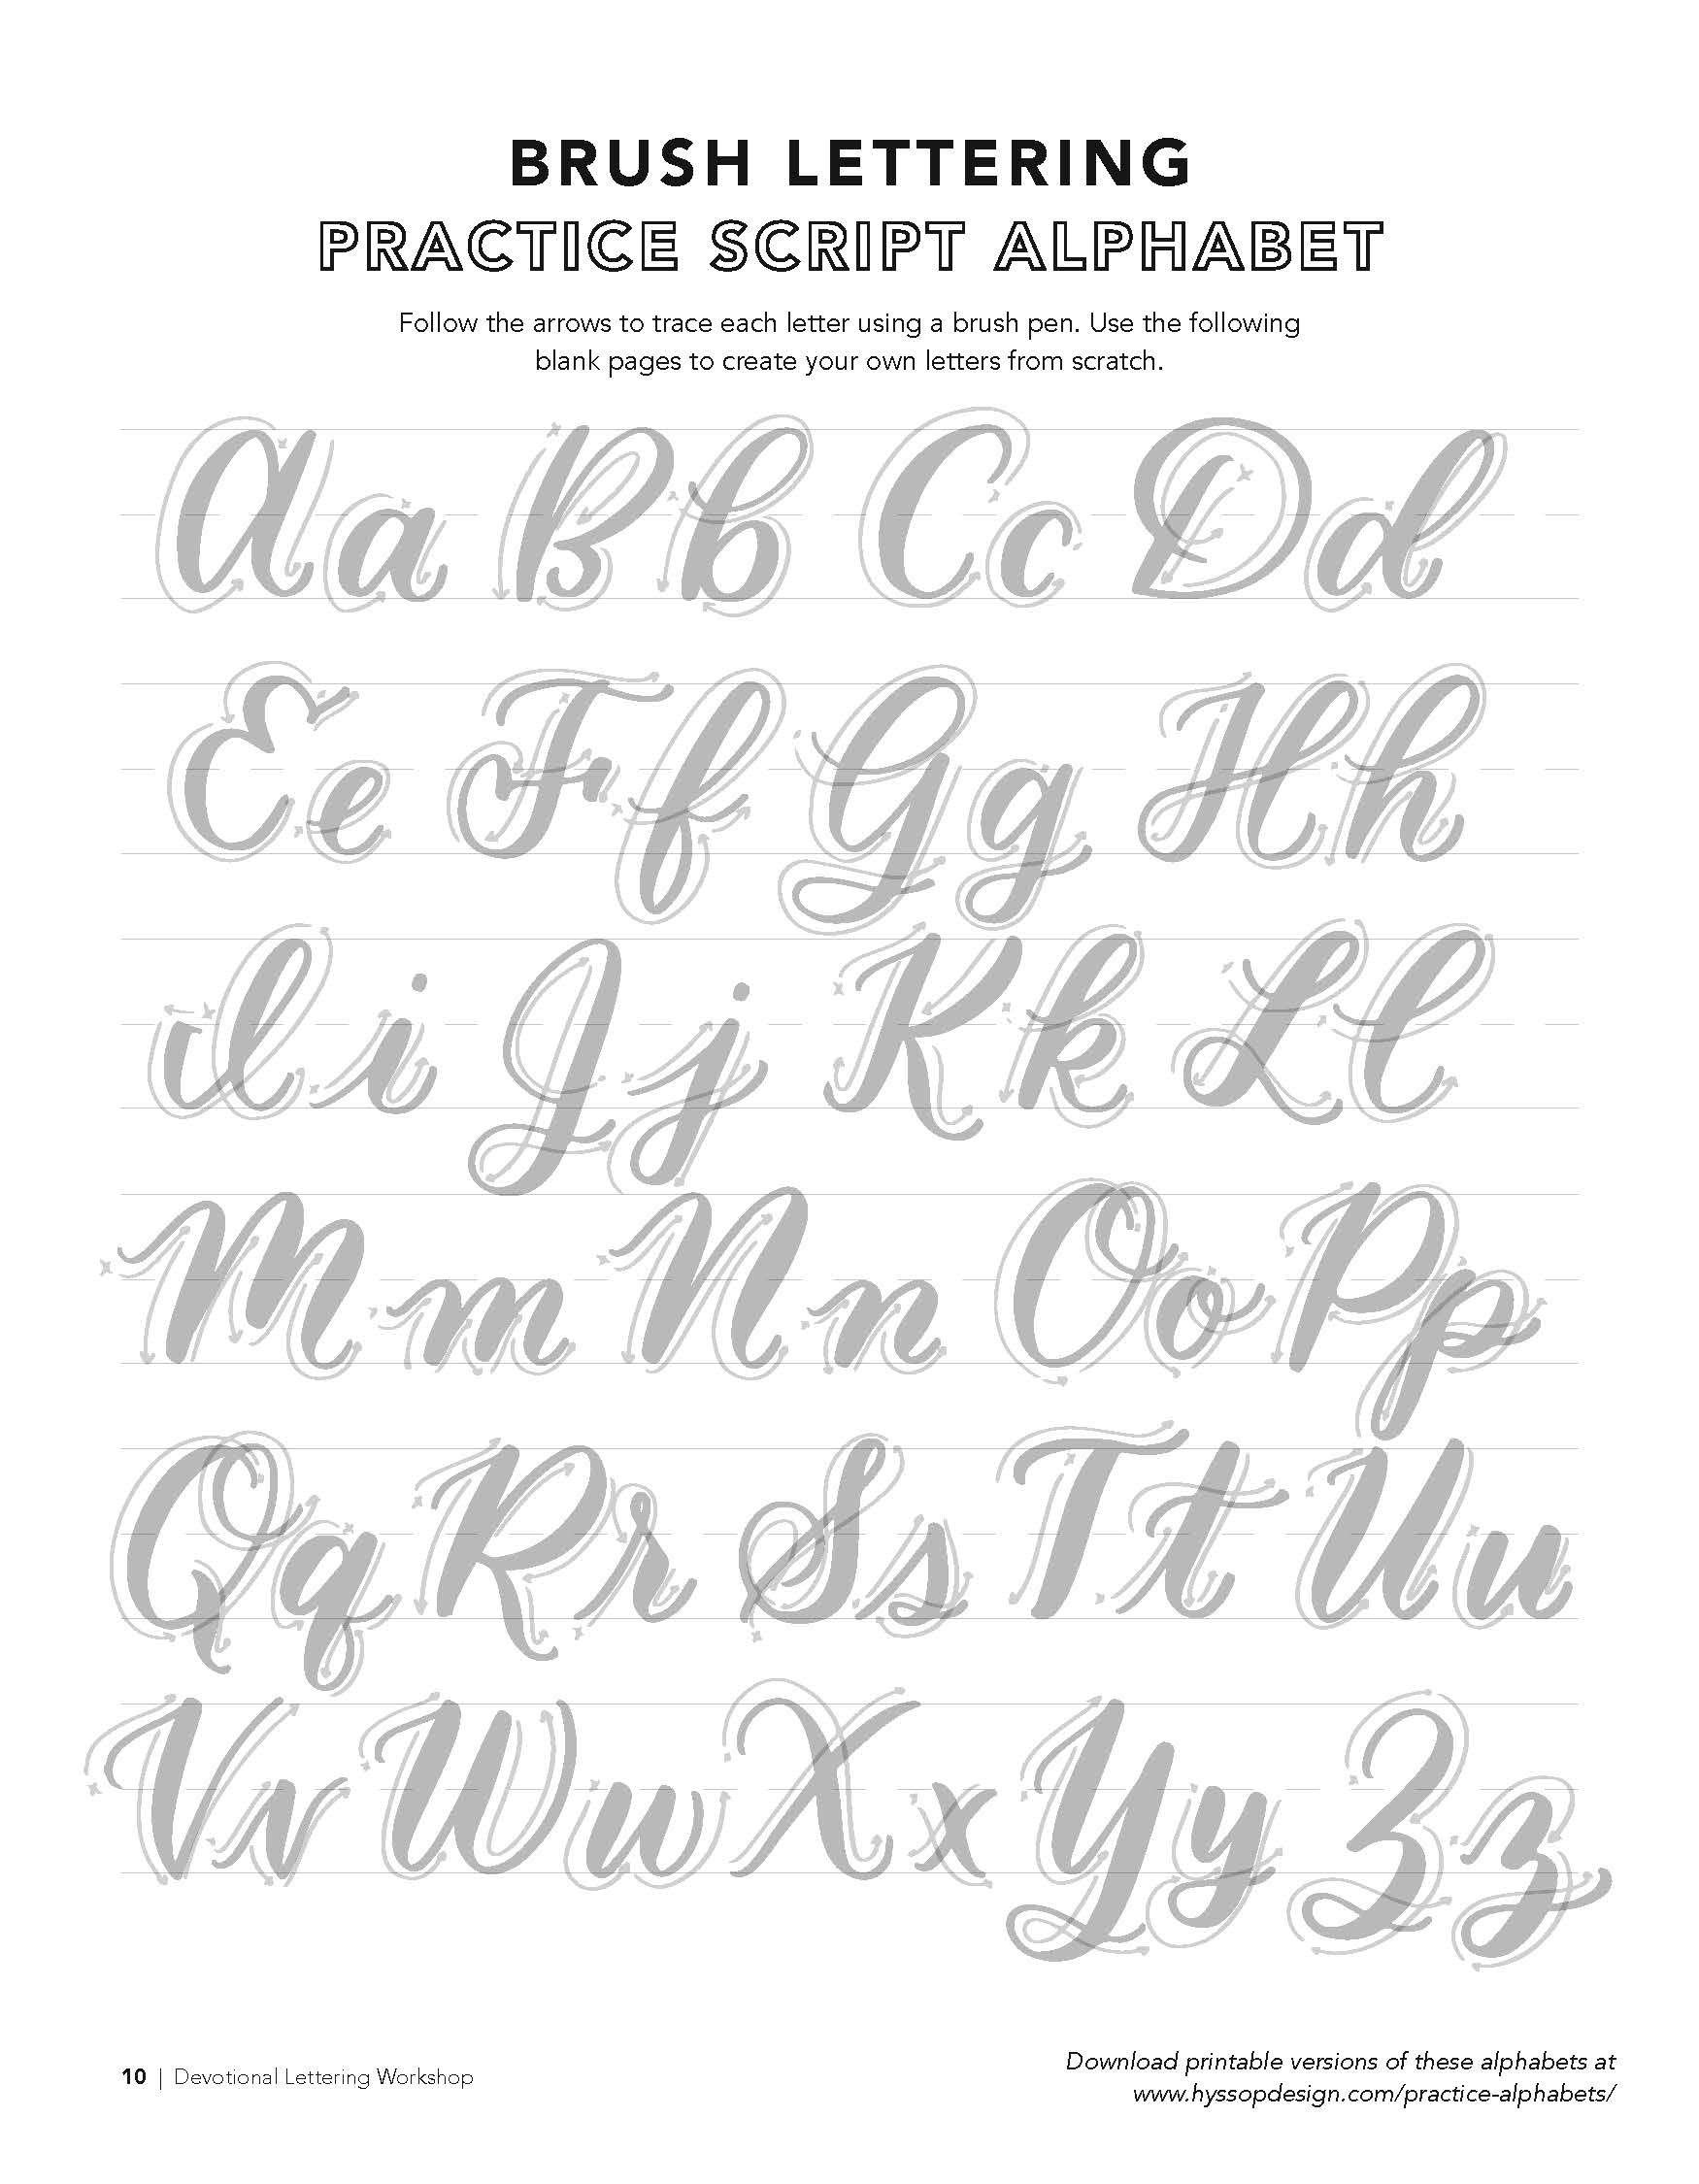 Free Calligraphy Alphabets Jacy Corral Brush Lettering Worksheet Lettering Alphabet Hand Lettering Worksheet [ 2250 x 1750 Pixel ]